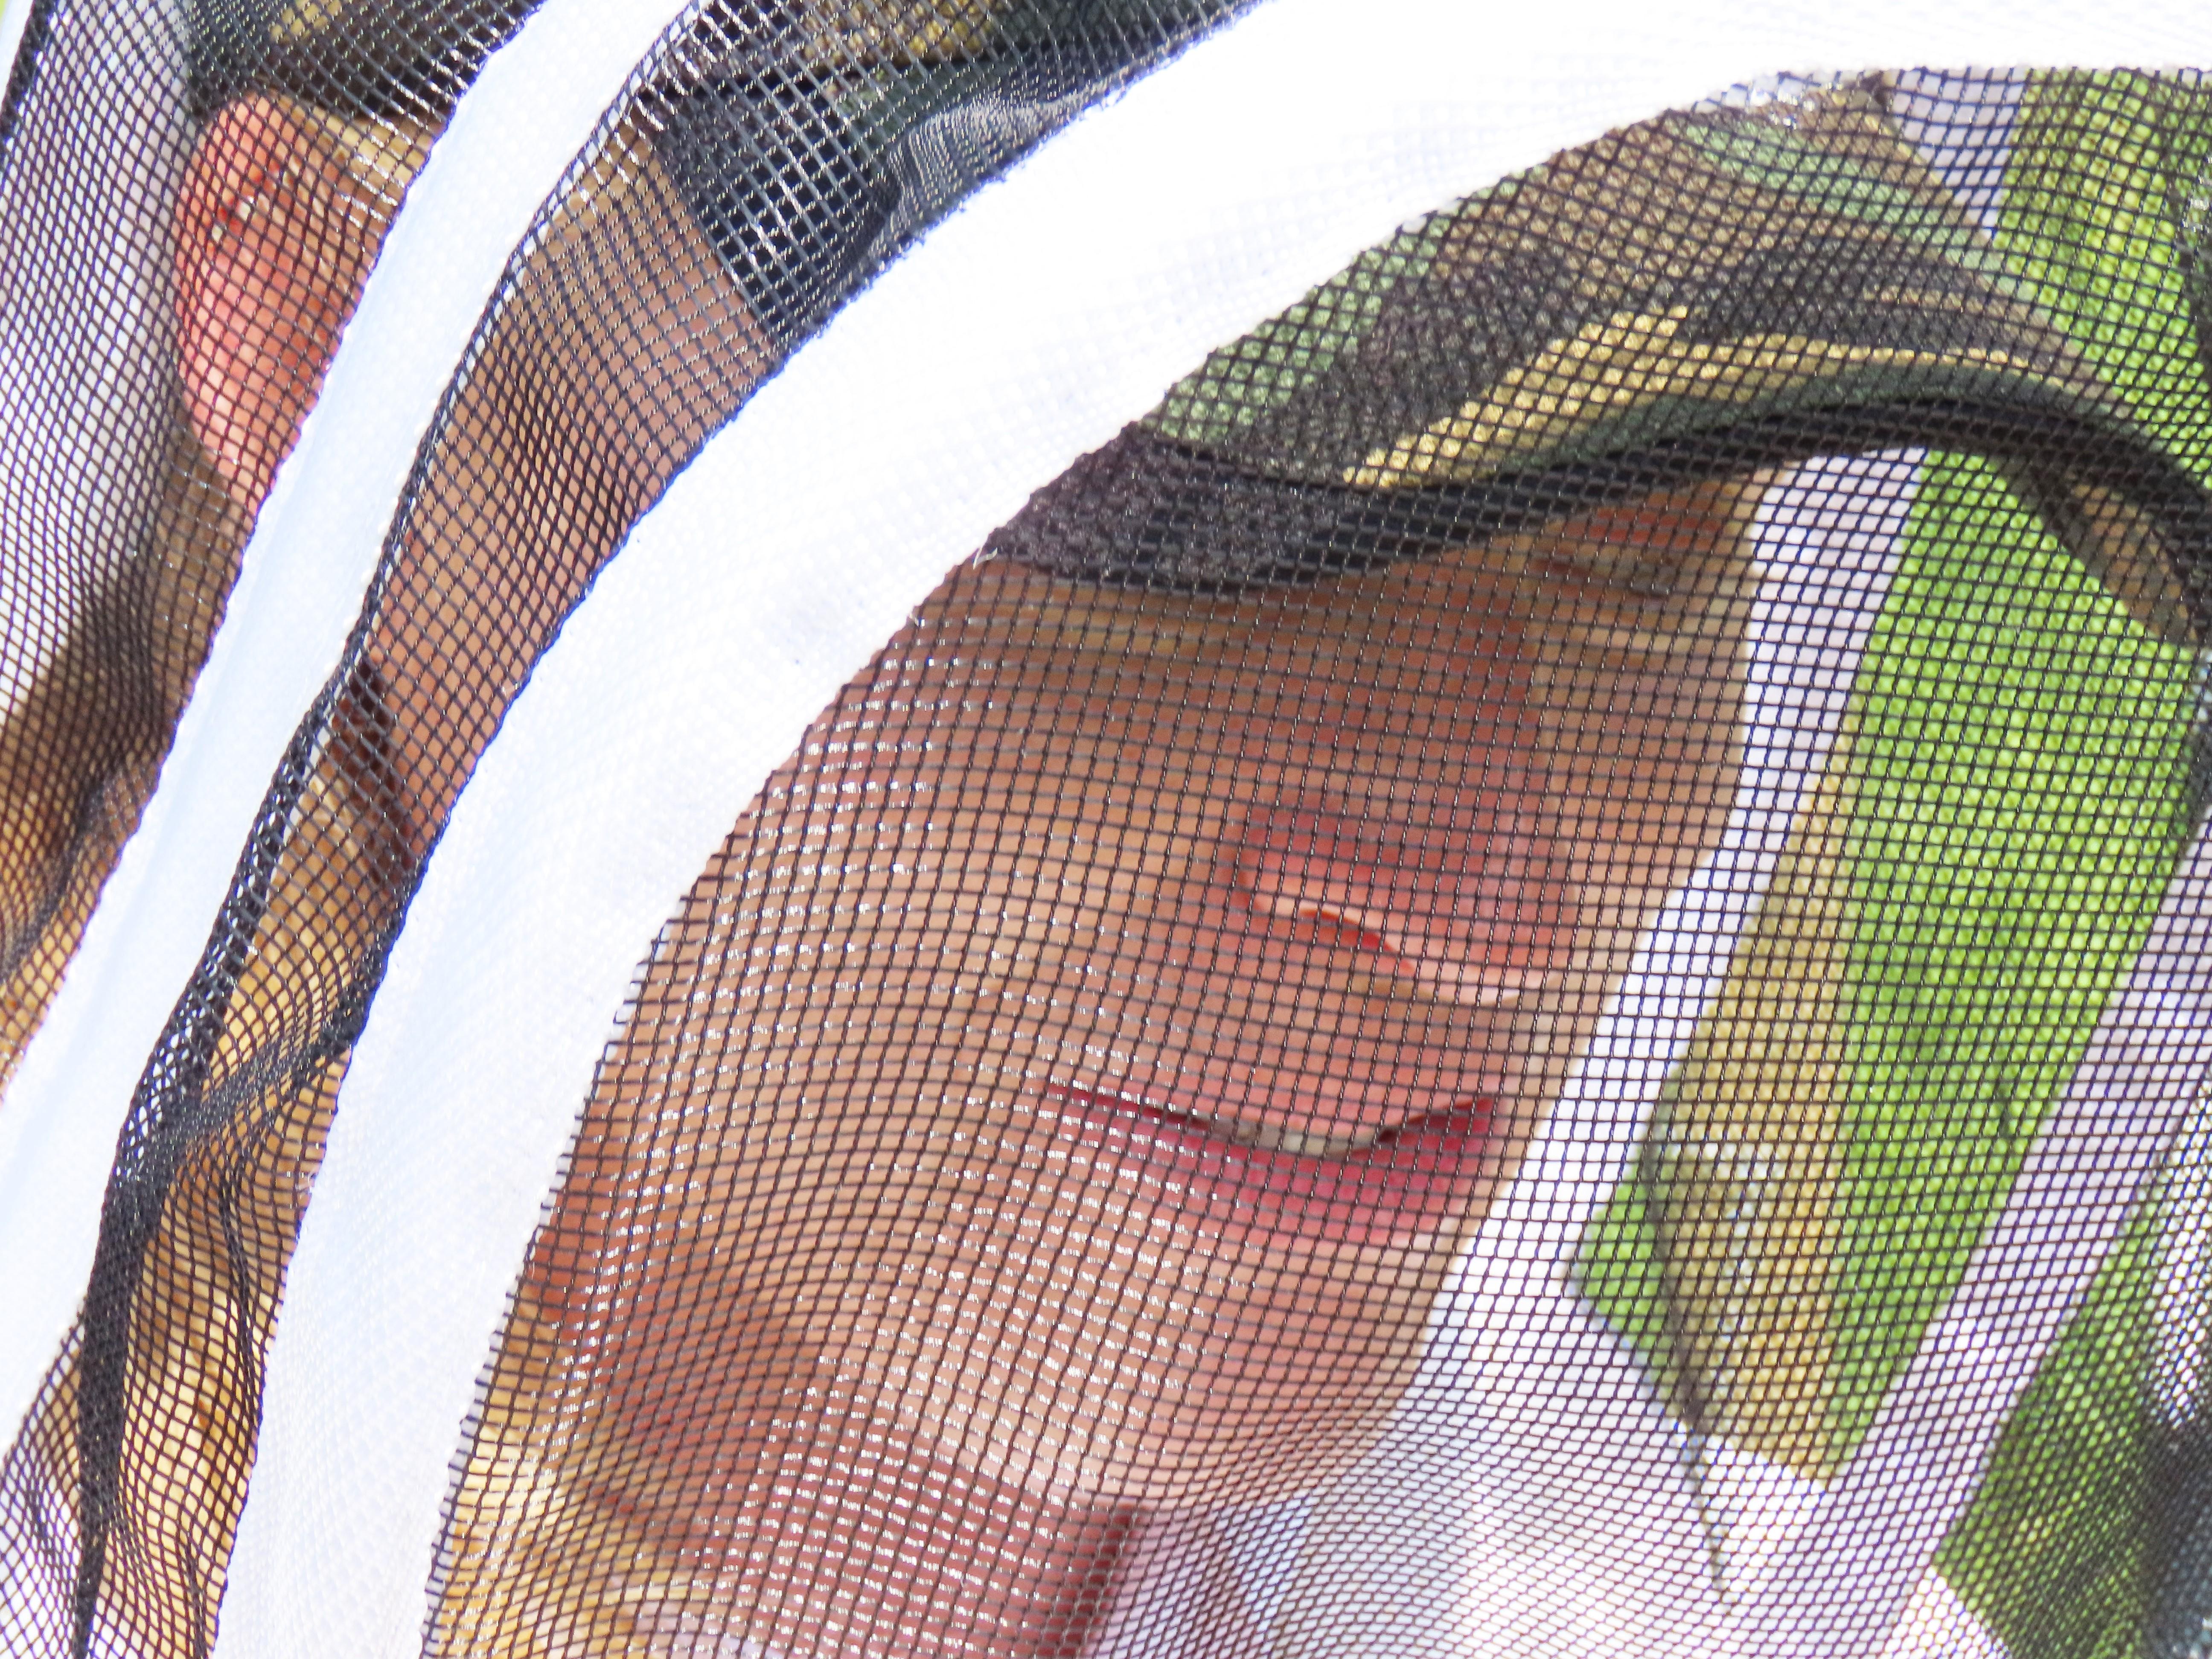 beekeeper veil